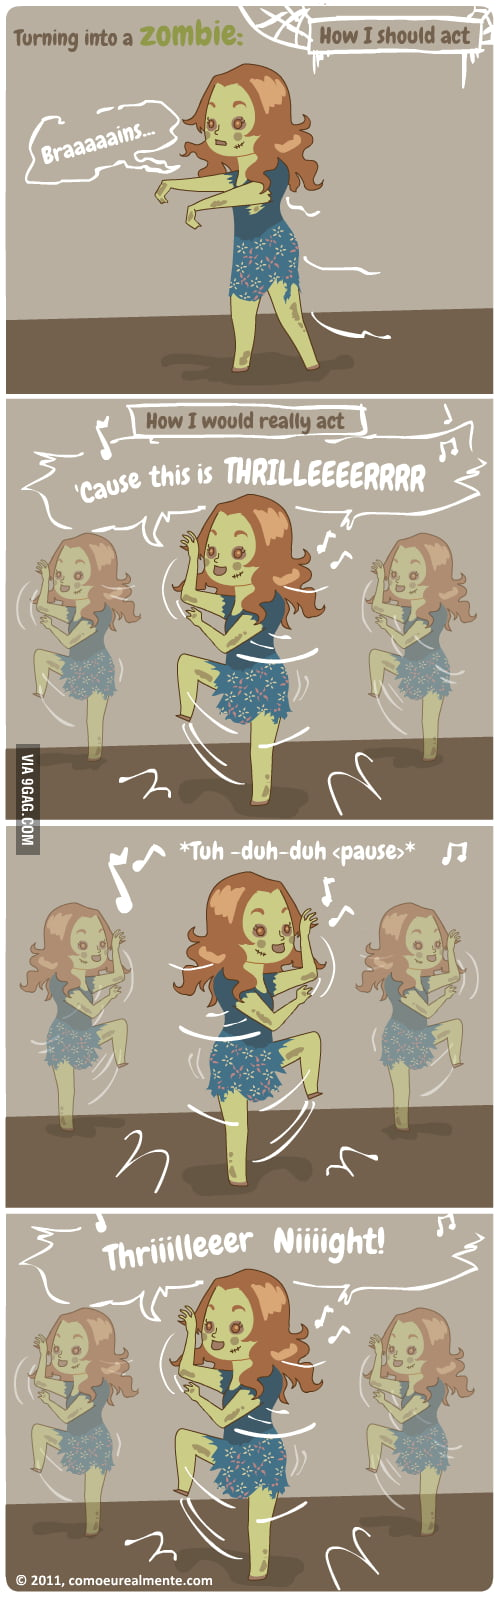 Zombie flashmob (or fleshmob *tu-dum-tss*)